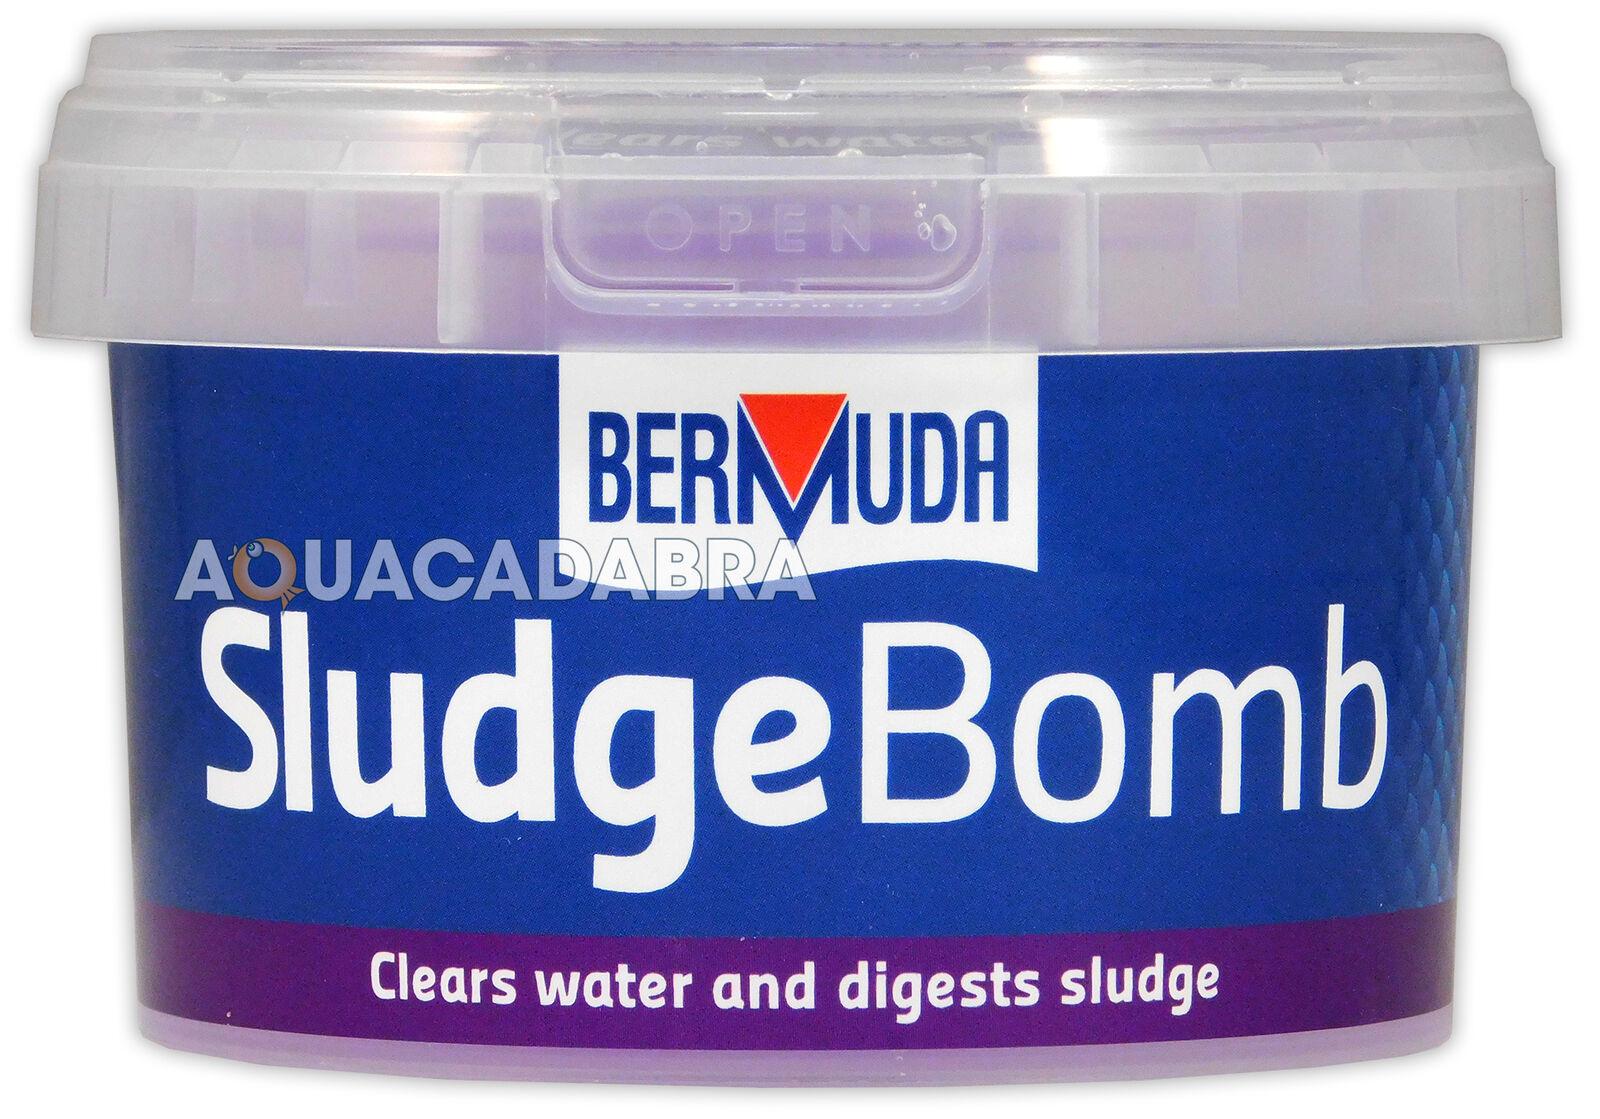 Bermuda Sludge Bomb Pond Crystal Clear Water Breaks Down Waste Healthy Fish Koi